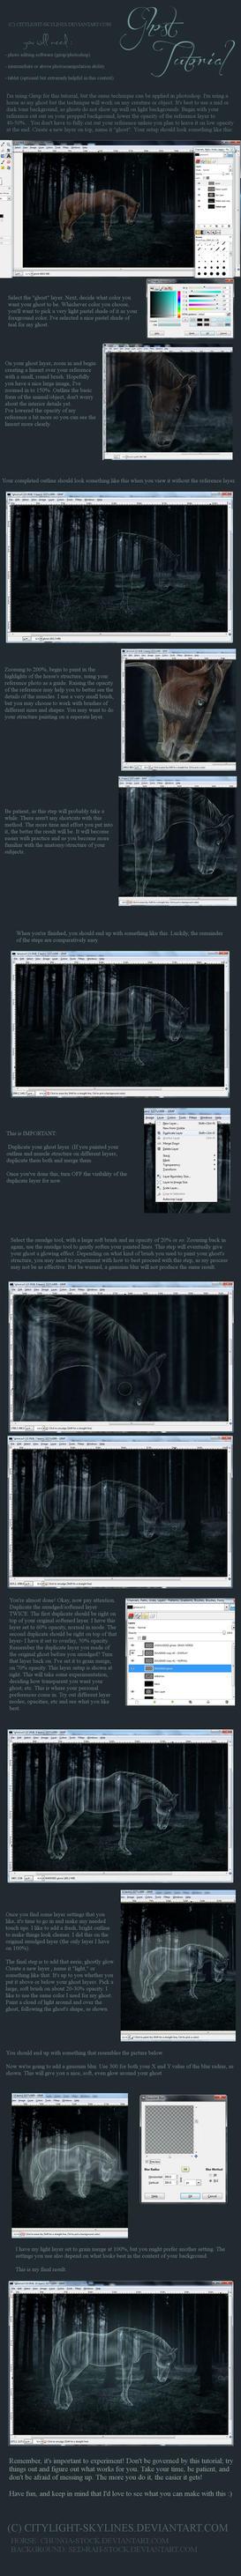 ghost tutorial. by citylight-skylines